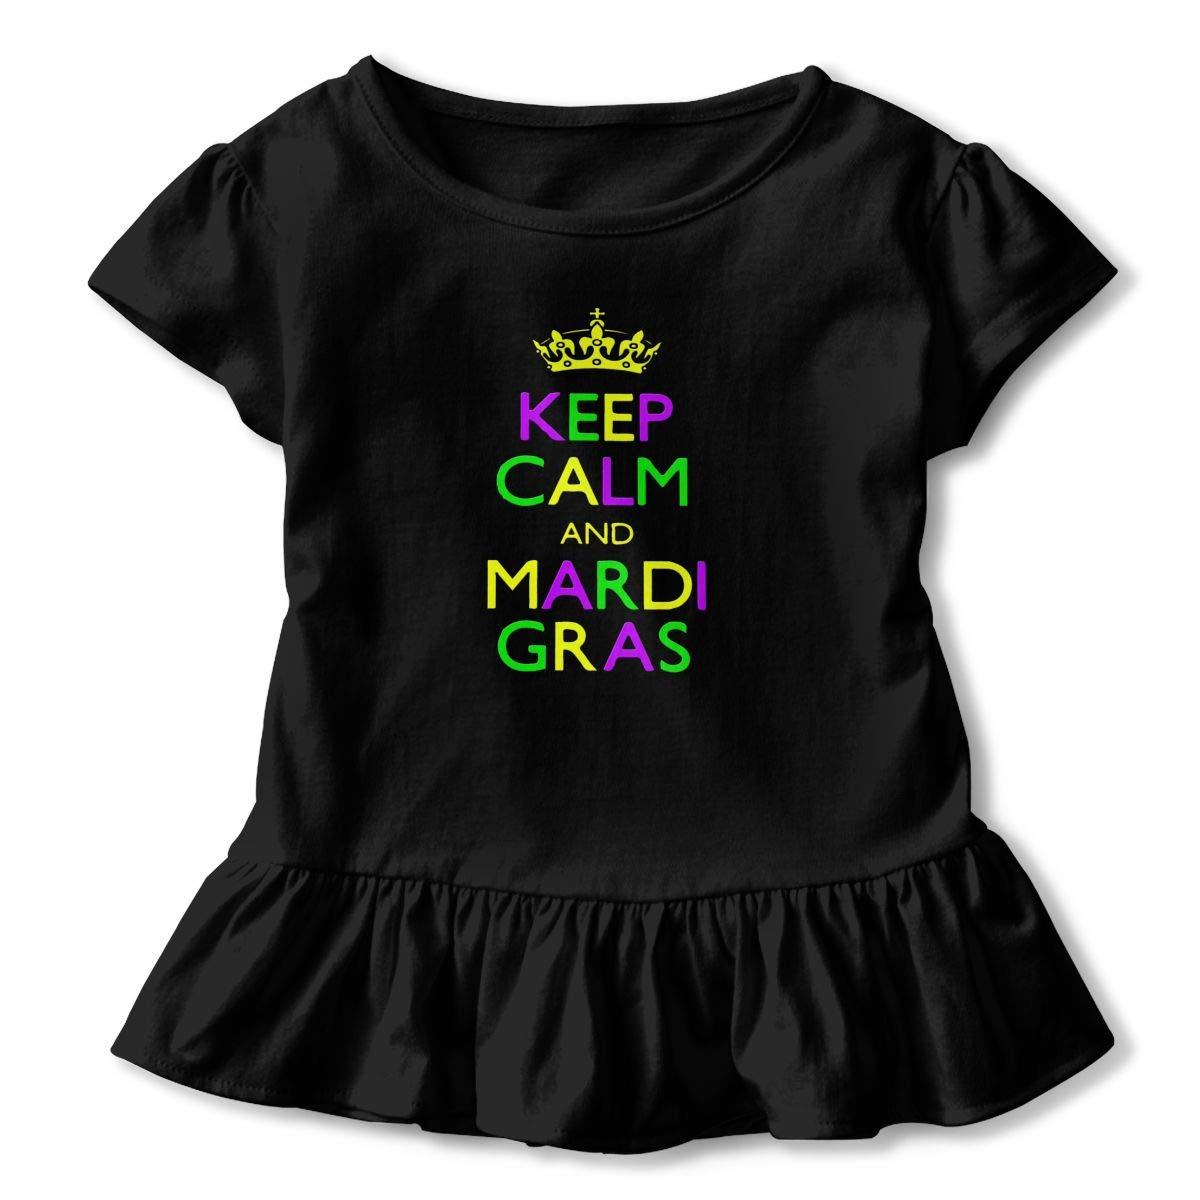 Clarissa Bertha Keep Calm Mardi Gras Funny Toddler Baby Girls Short Sleeve Ruffle T-Shirt